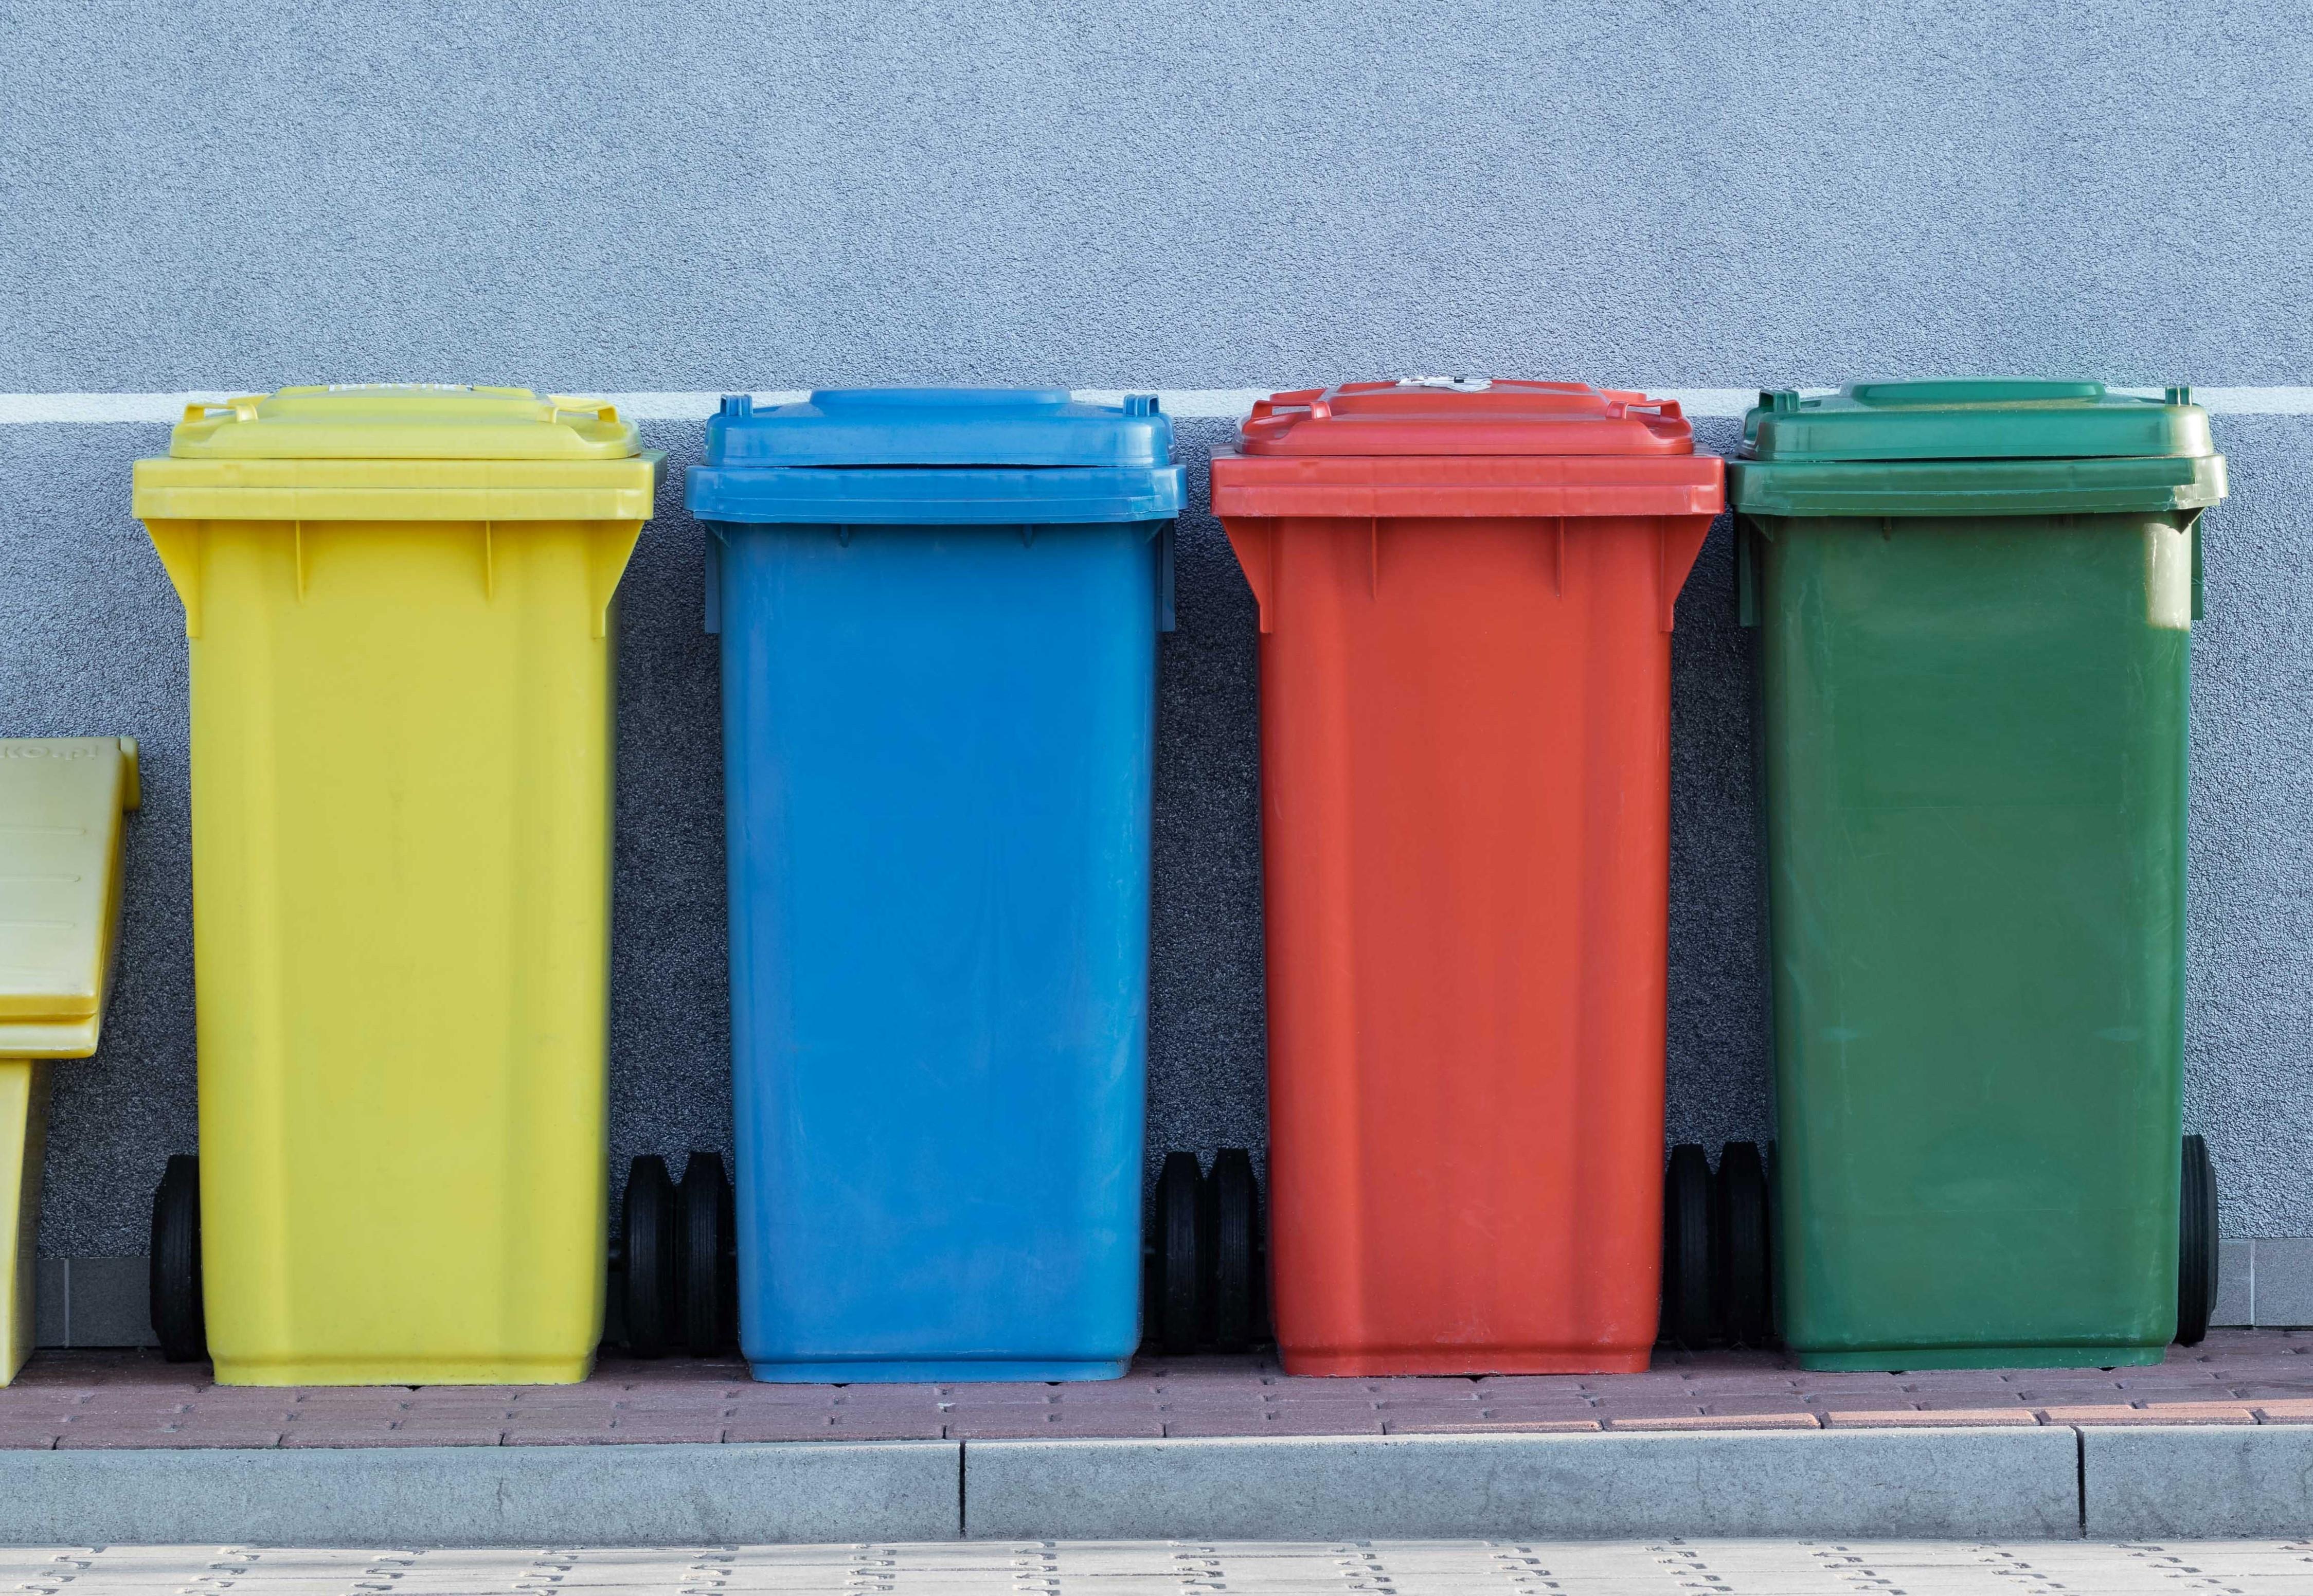 trash pawel-czerwinski-RkIsyD_AVvc-unsplash (2)